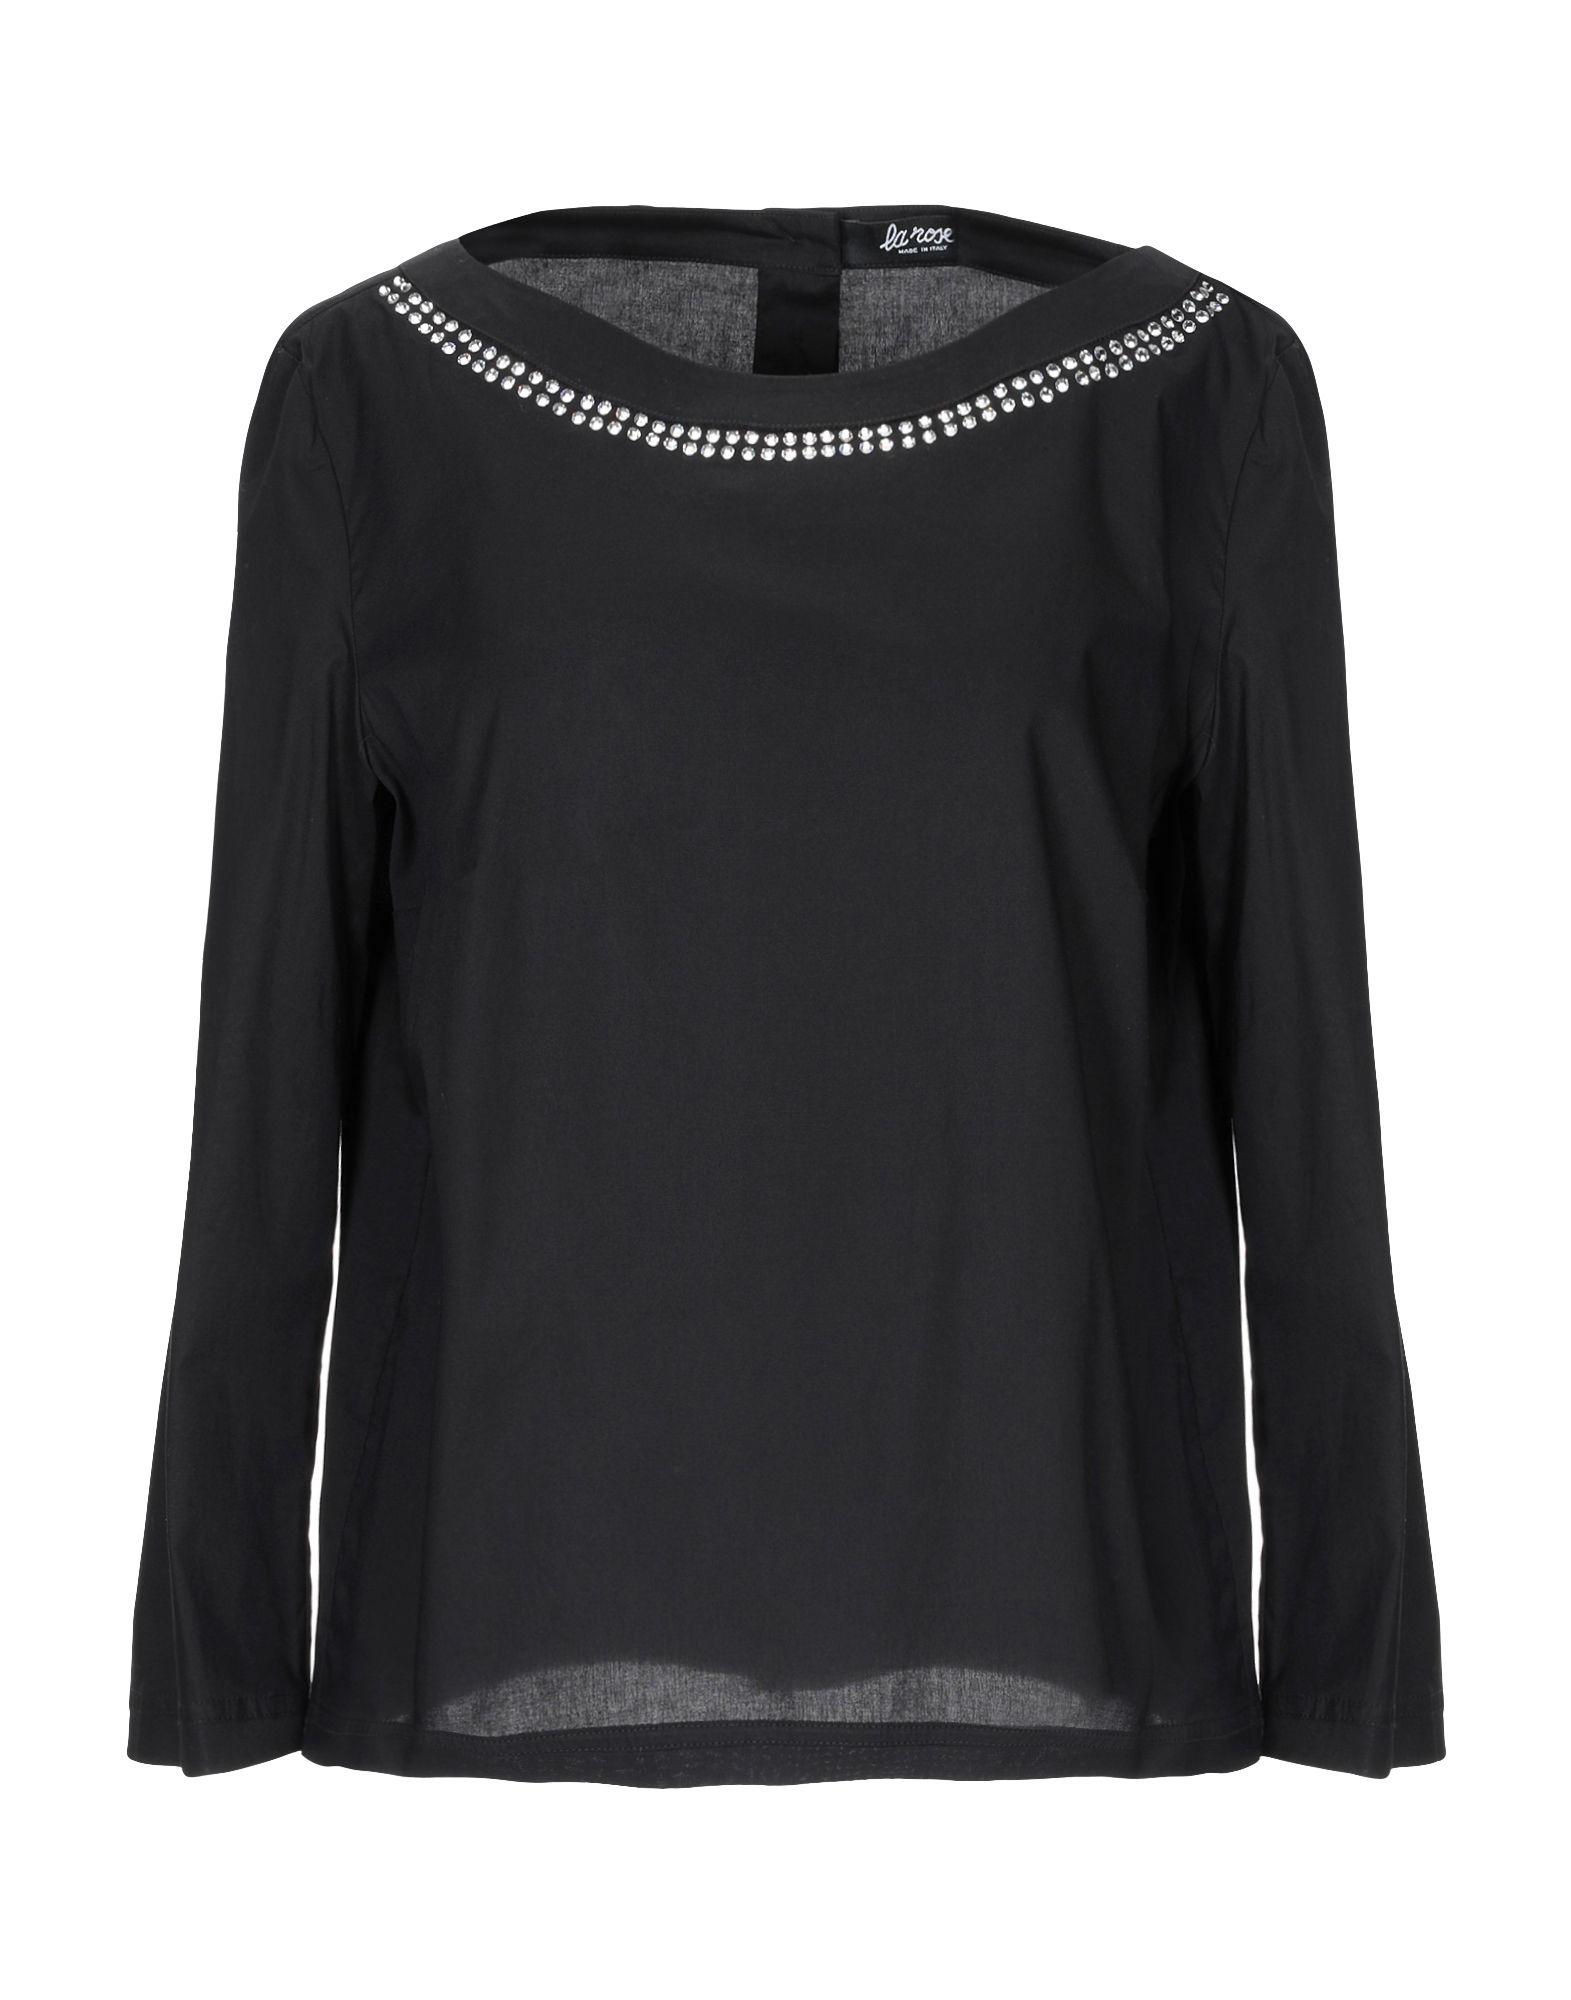 LA ROSE Блузка la ligne блузка